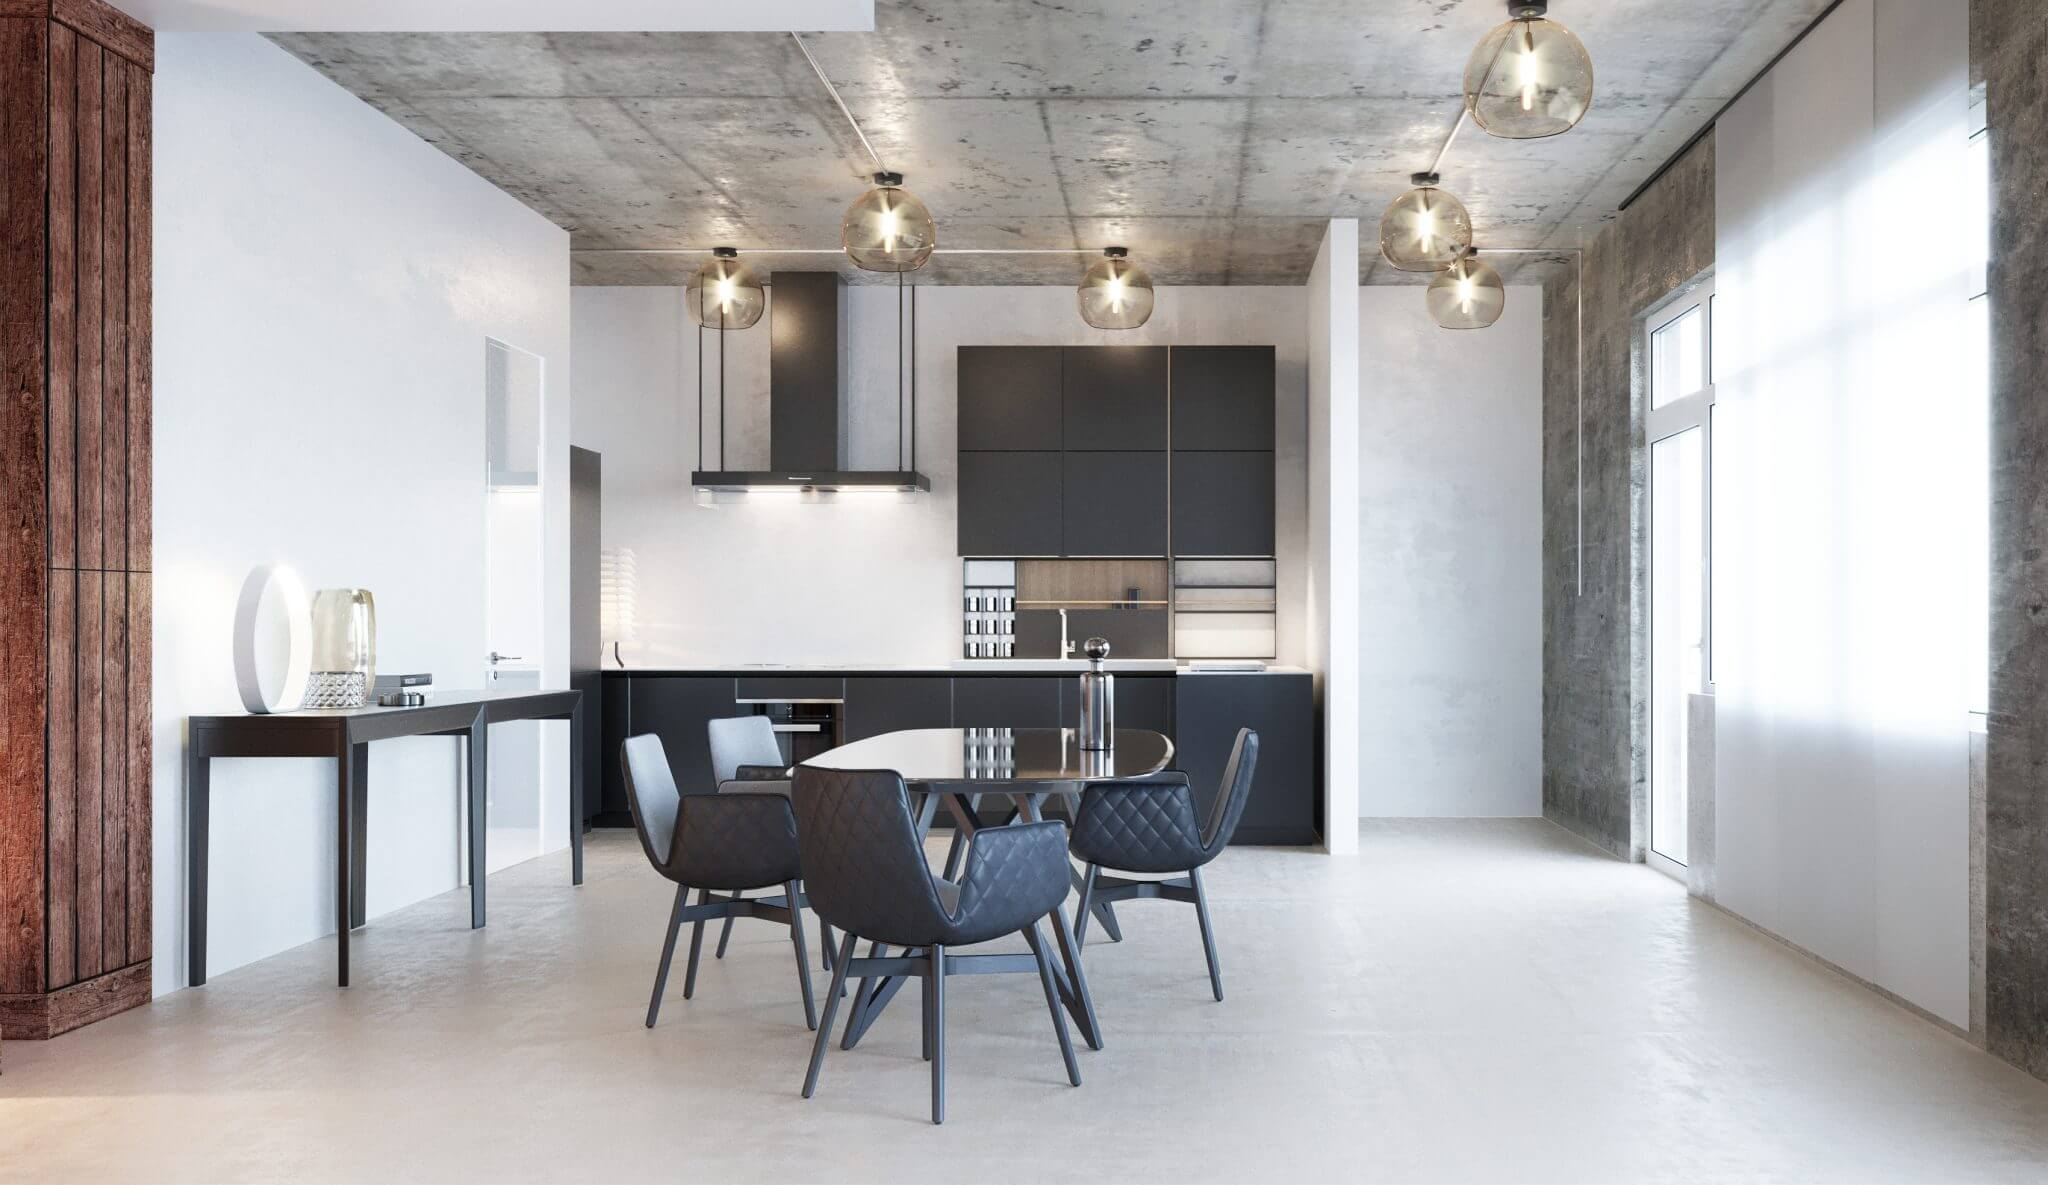 urbanloft s schniegling s visualization studio. Black Bedroom Furniture Sets. Home Design Ideas